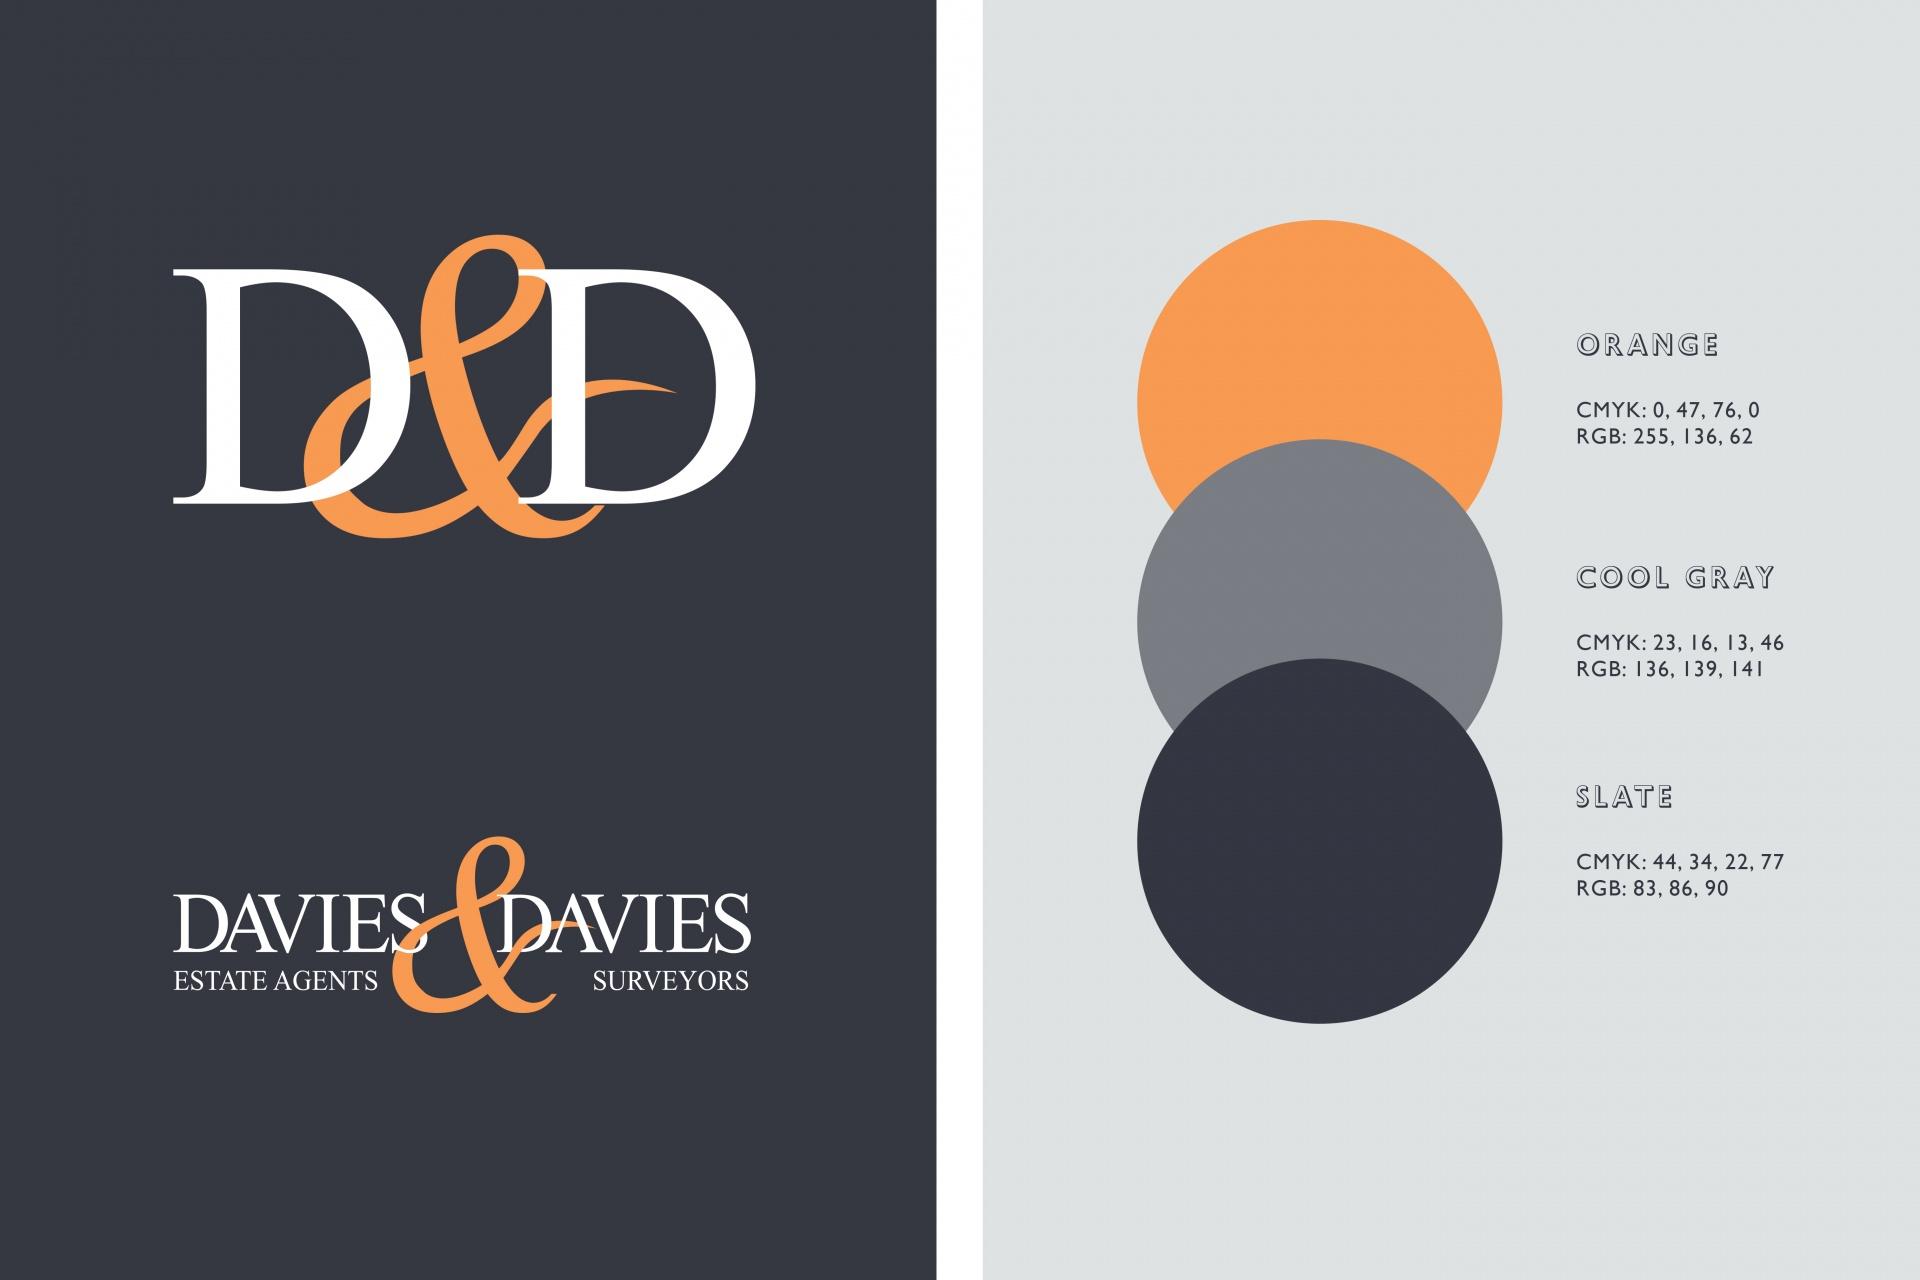 Davies Davies Estate Agents Branding, brand identity, brand design, graphic design, estate agents, london, england,